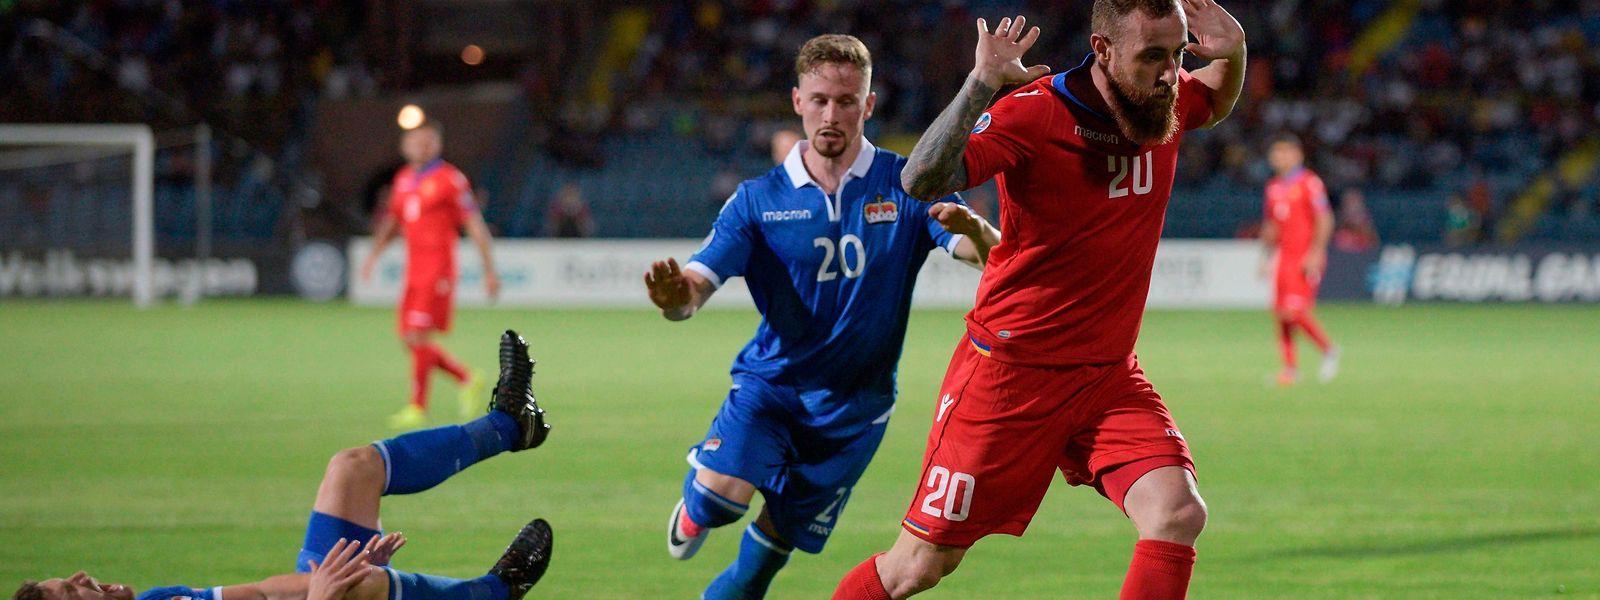 Alexandre Karapetian traf auch bereits am Samstag gegen Liechtenstein.